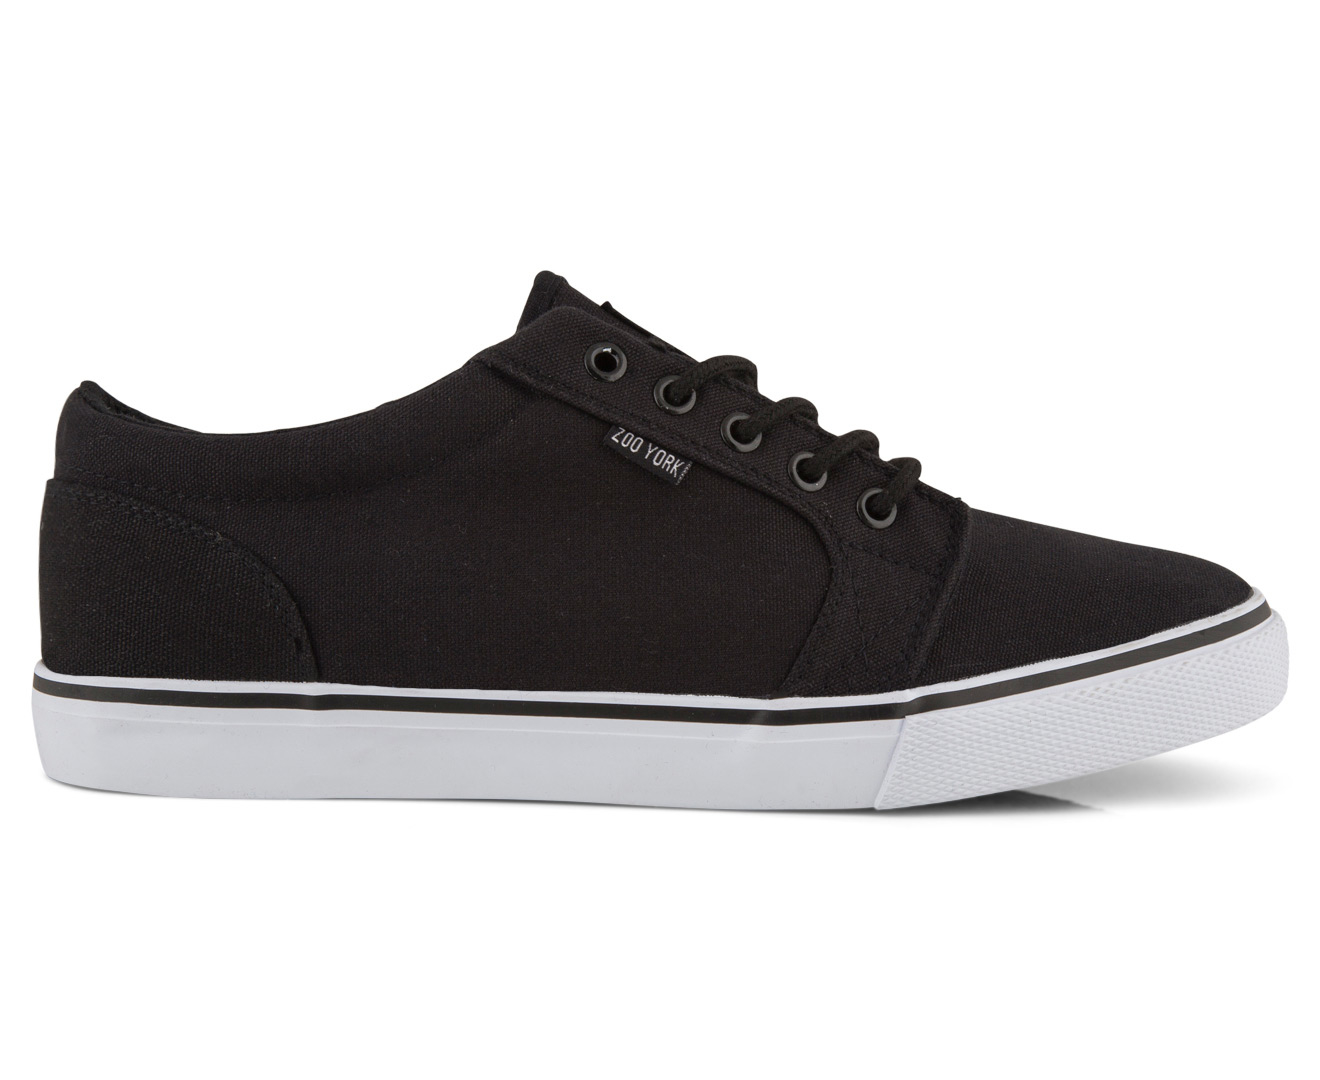 Wonderful Zoo York Menu0026#39;s Skateboard Shoes Empire 42027 Black White | EBay